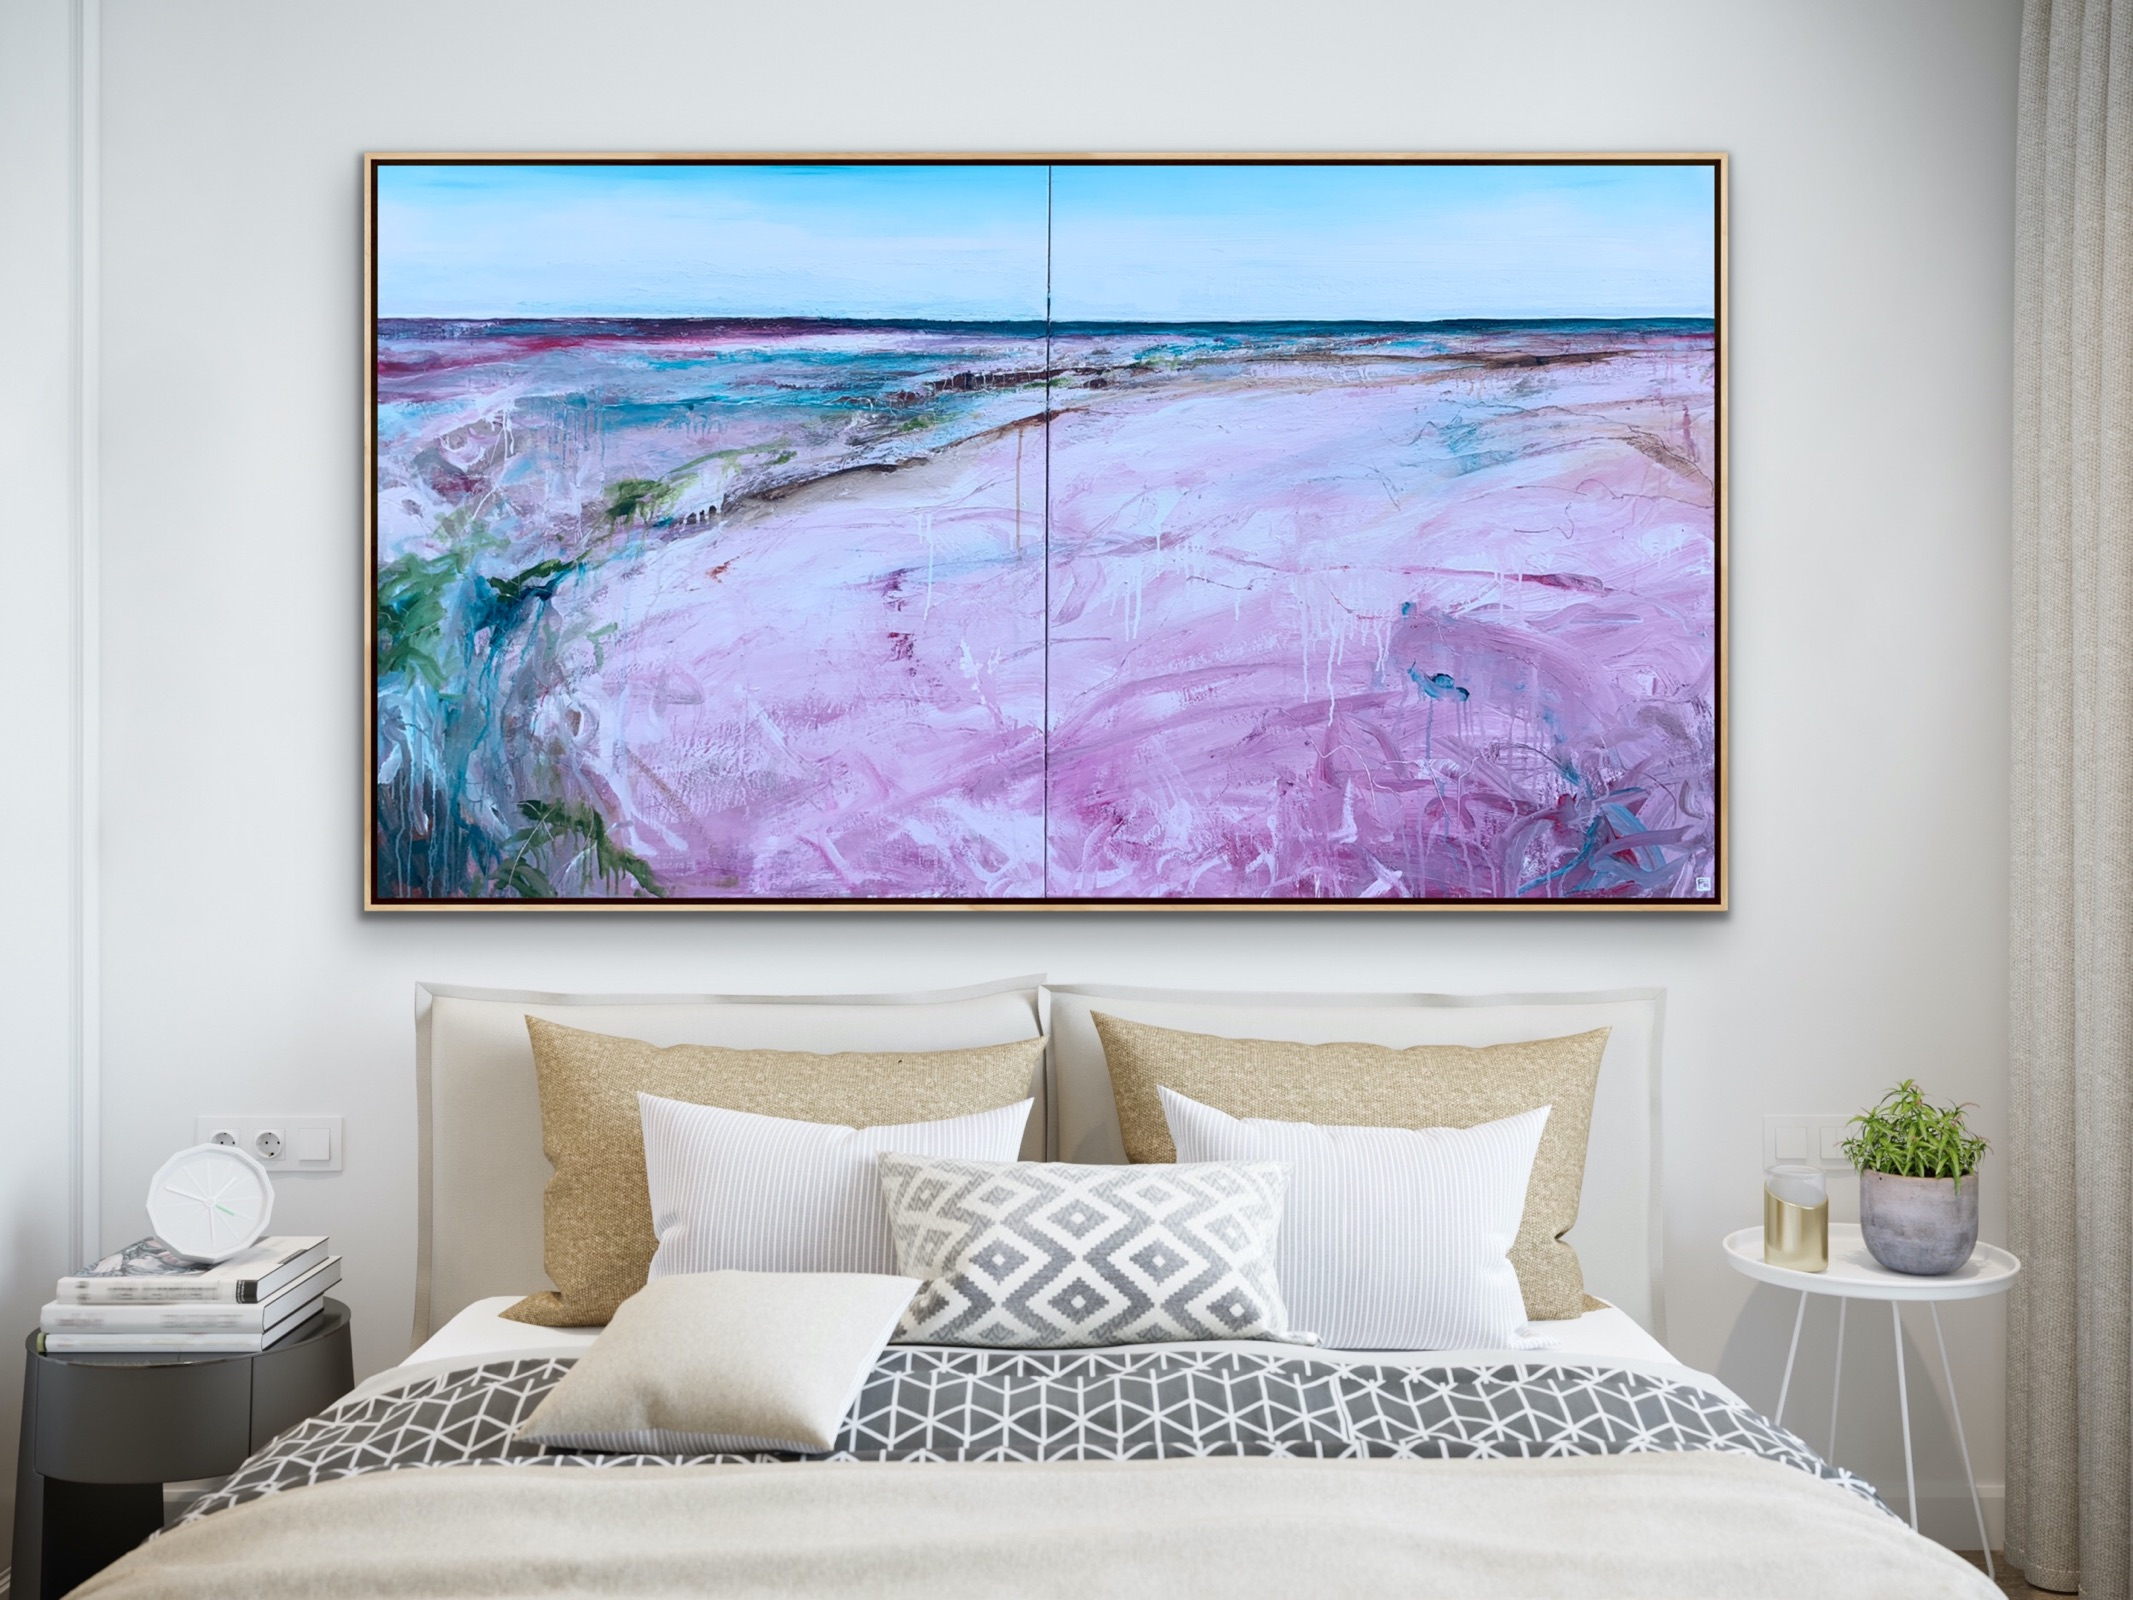 Velvet Coral Bay Tania Chanter Inroom